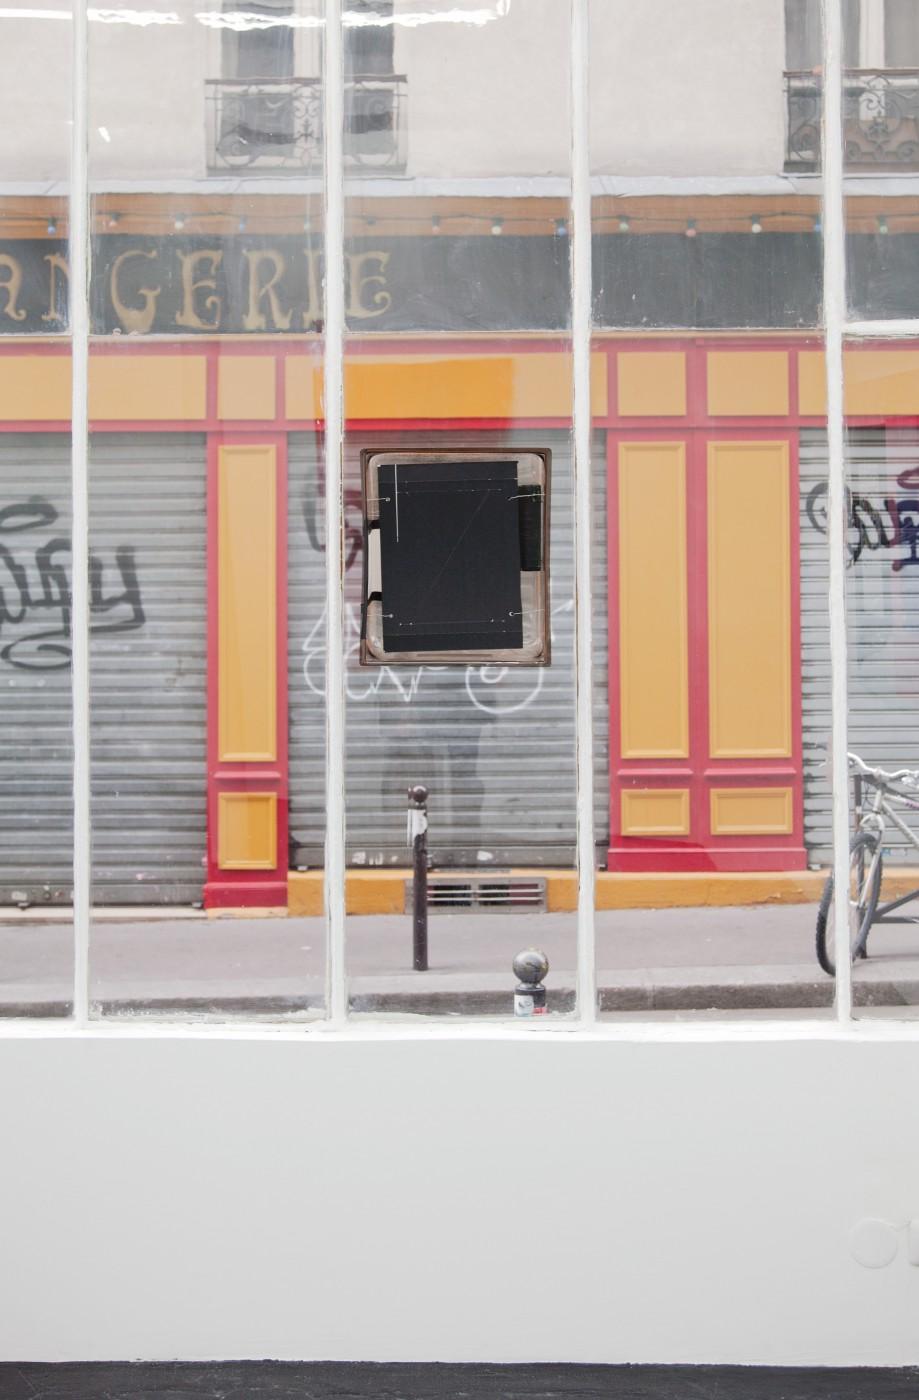 ♥ Bradley Kronz,  Untitled , 2013   Acrylic box, cardstock, ink, tape, wire, flashlight, book jacket   40 x 34 x 16 cm / 18 x 13 x 8 in OLGA BALEMA  DAVID DOUARD  ALLISON KATZ  BRADLEY KRONZ  TOM HUMPHRIES  HAN-CHRISTIAN LOTZ  LAURE PROUVOST